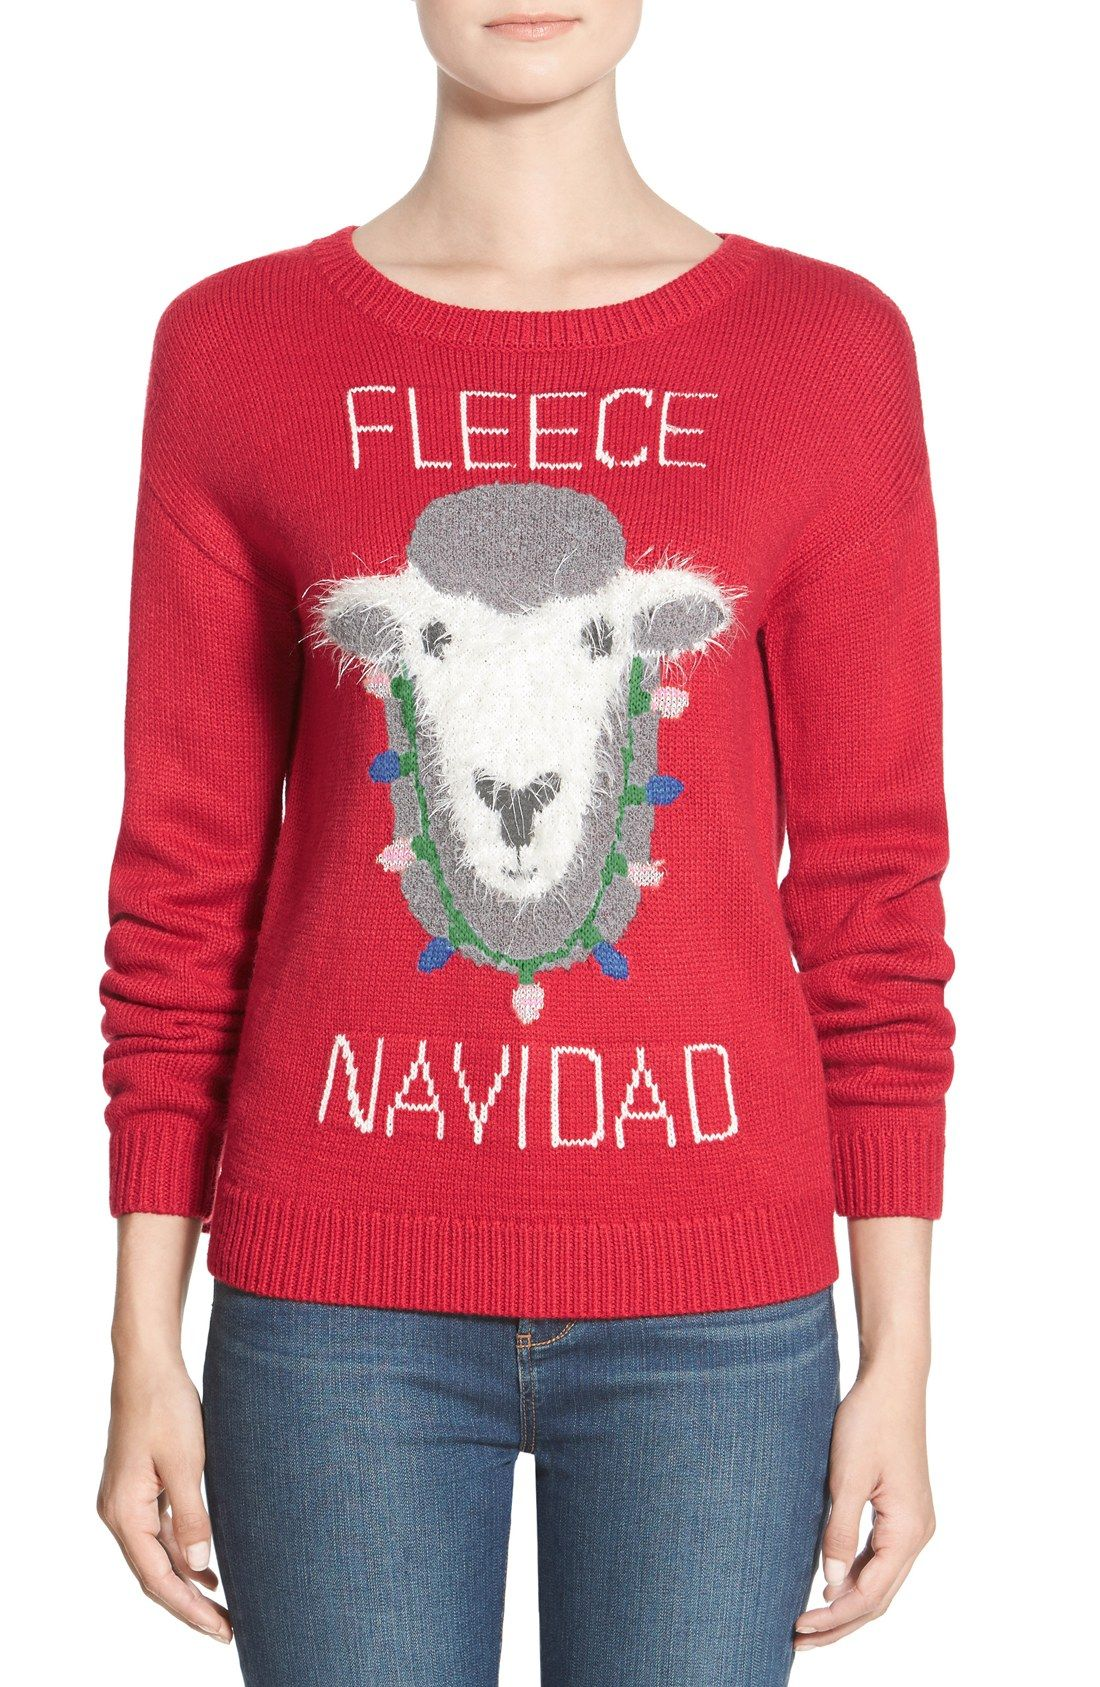 BP. \'Fleece Navidad\' Graphic Christmas Sweater | Nordstrom | Apparel ...